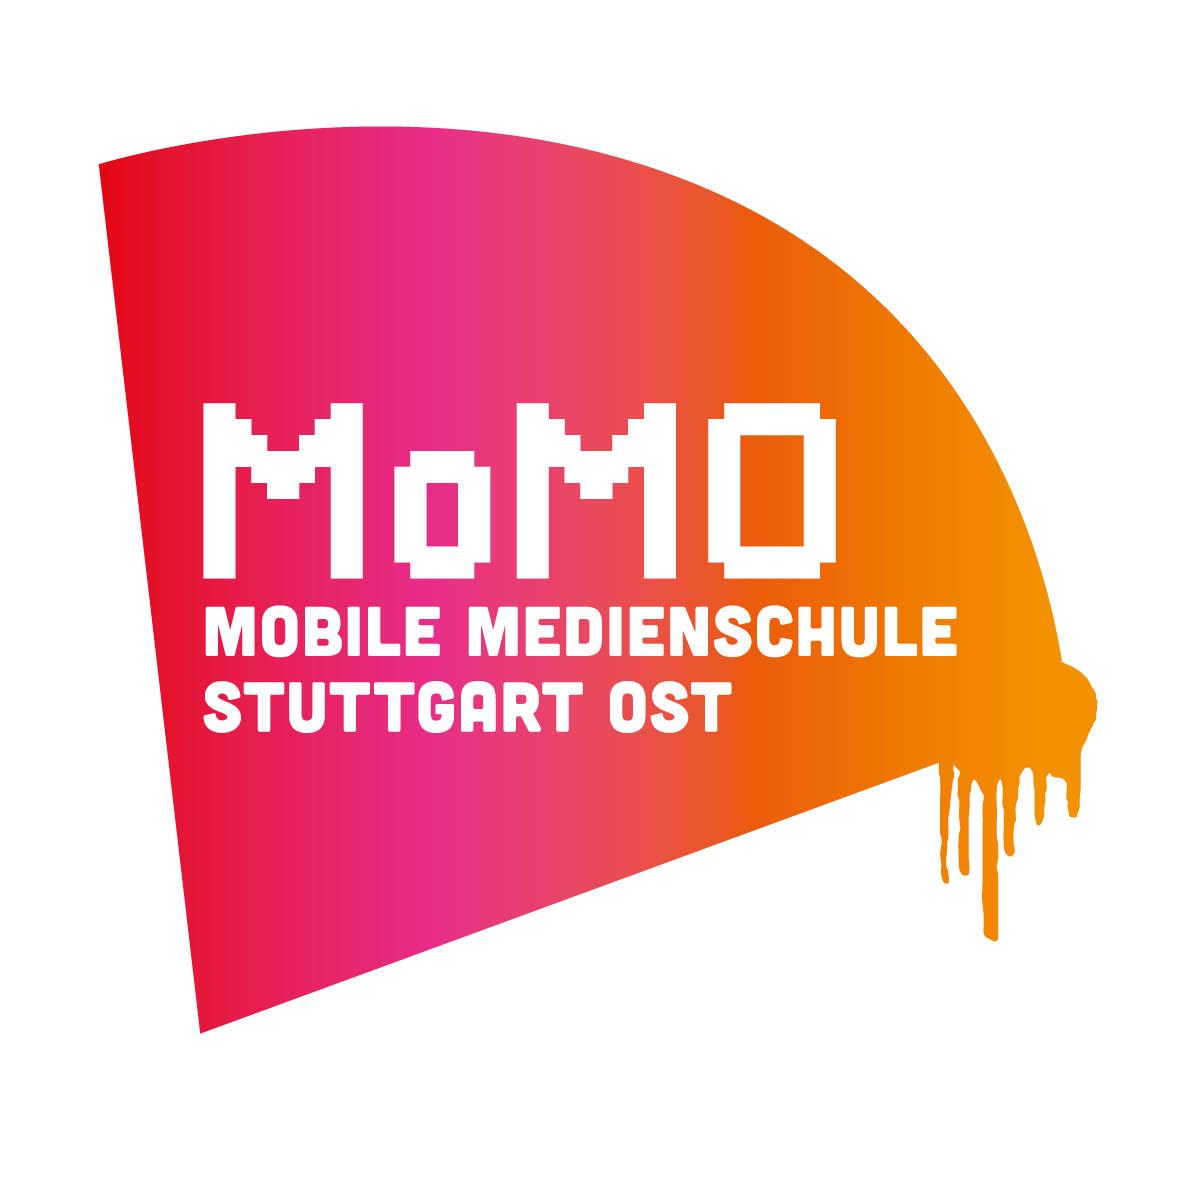 Mobile Medienschule Stuttgart Ost